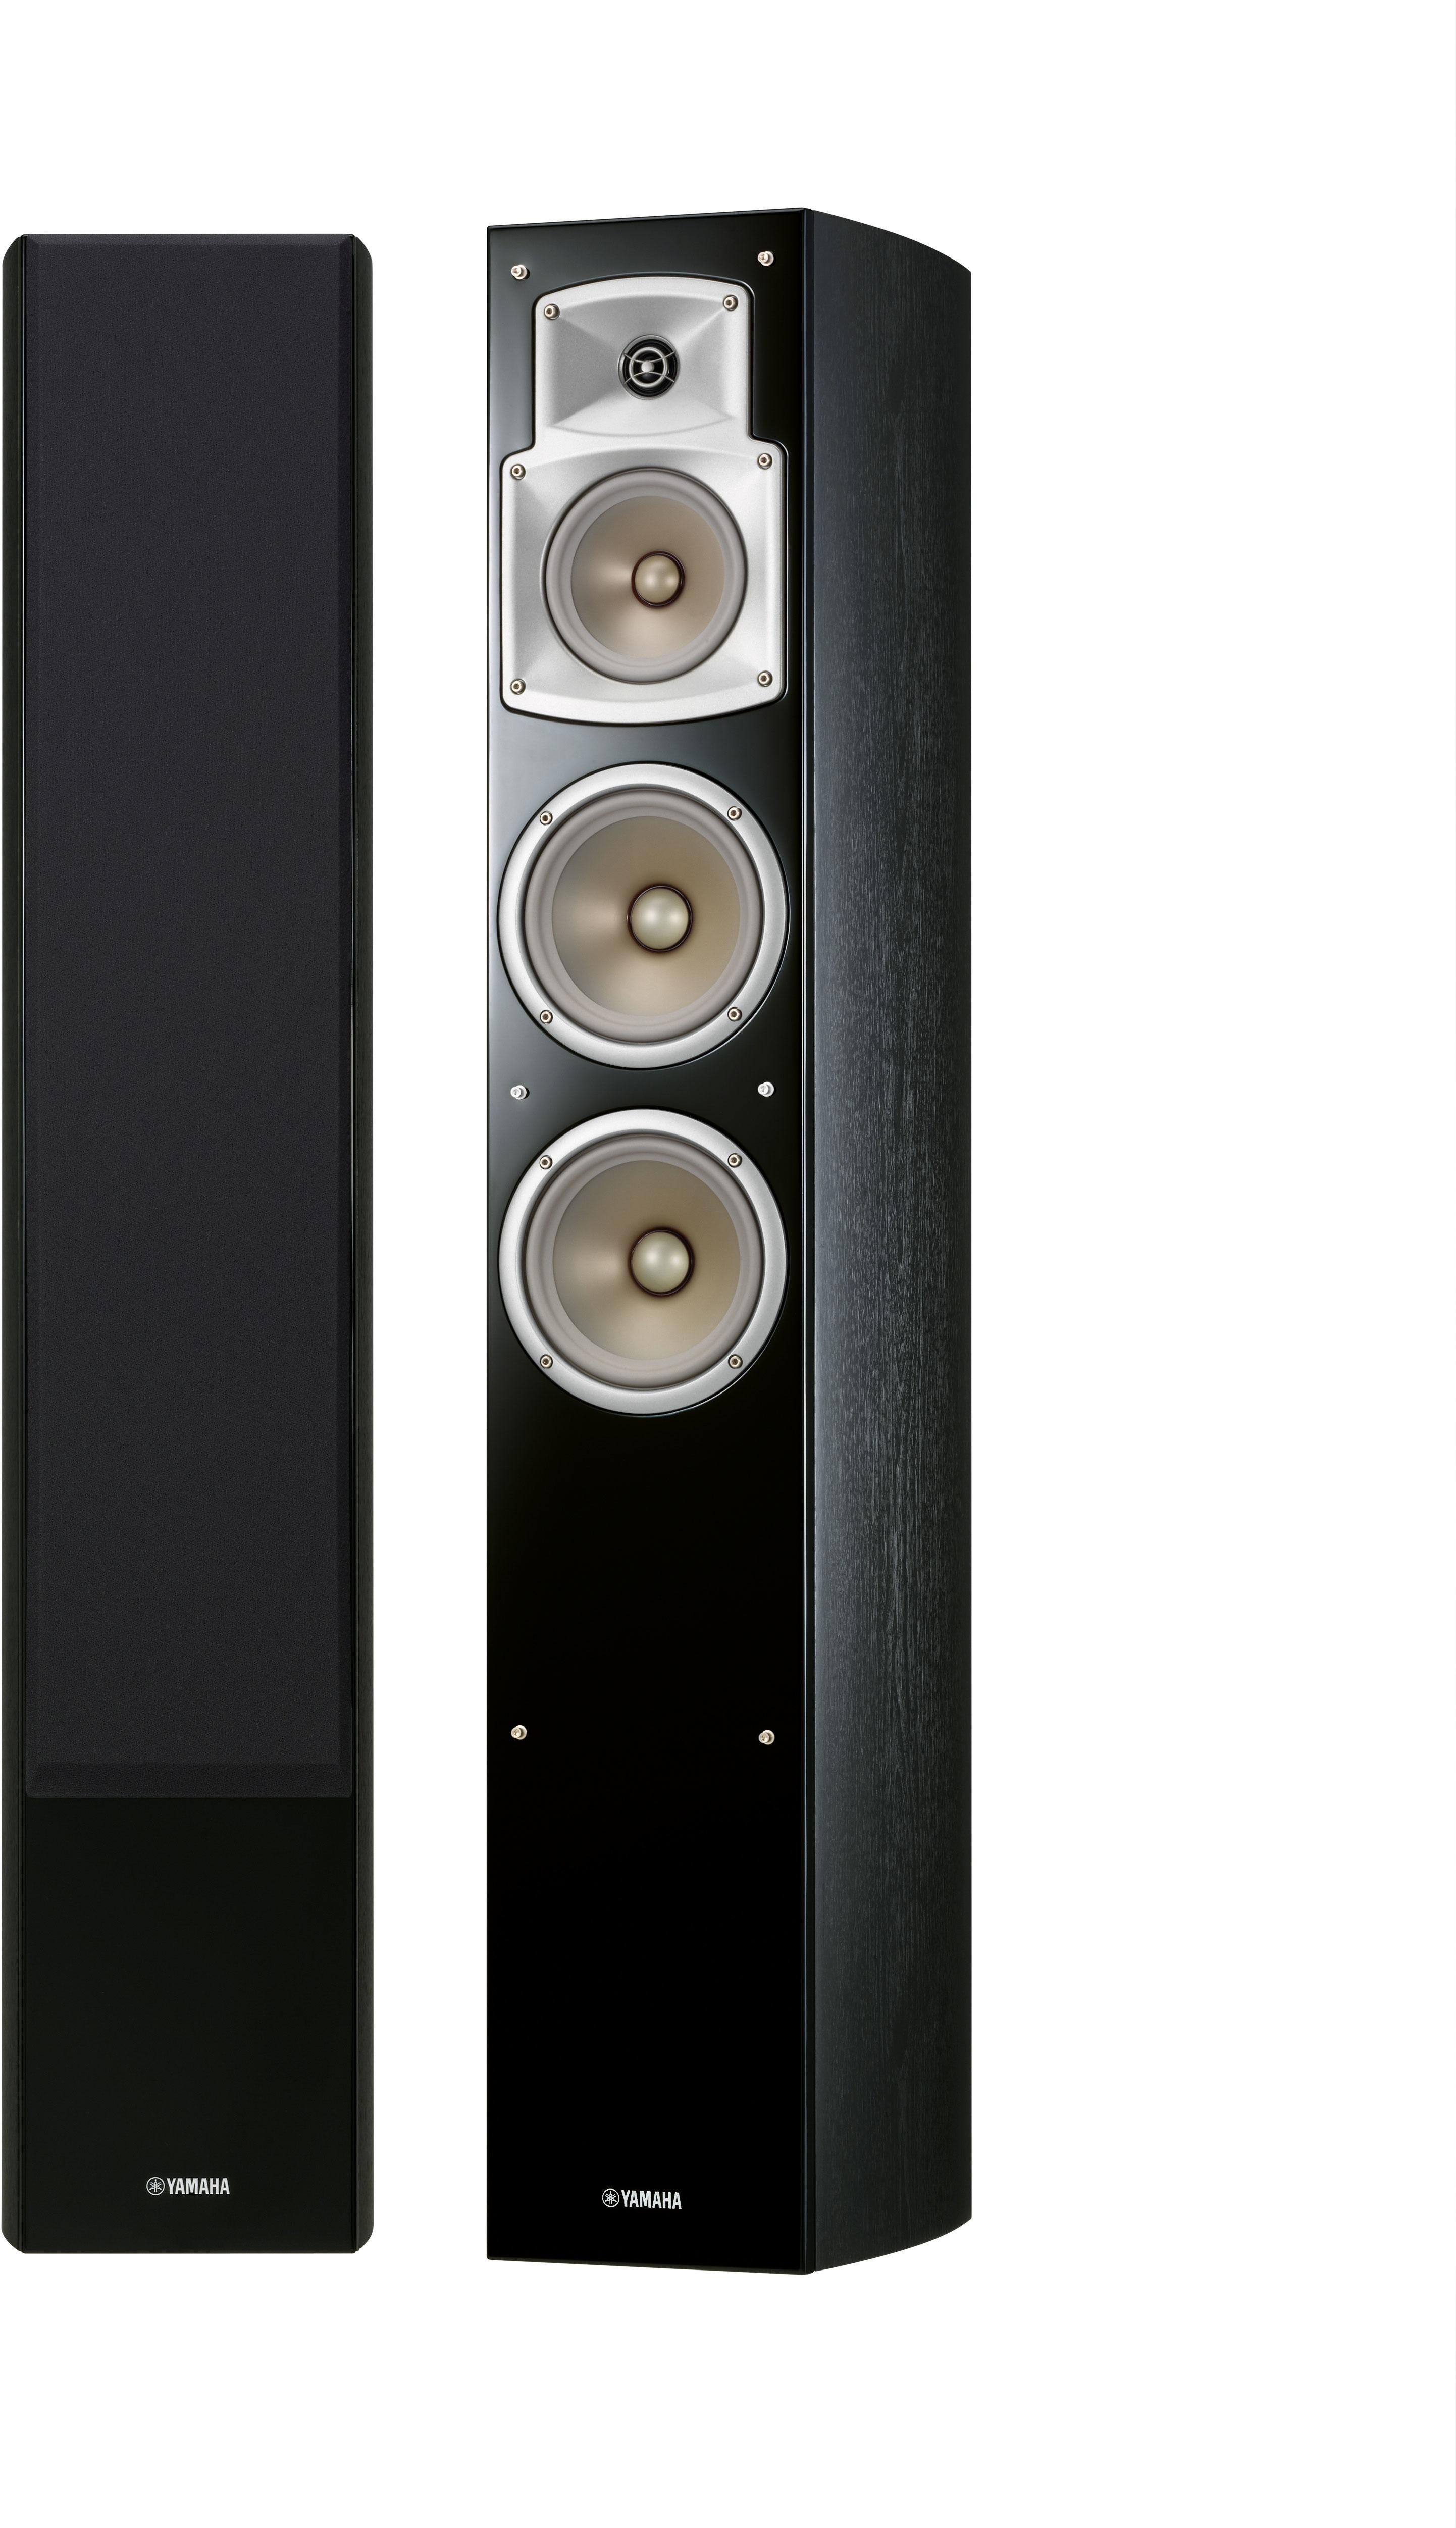 Yamaha ns f350 zwart specificaties tweakers for Yamaha ns sw40 price